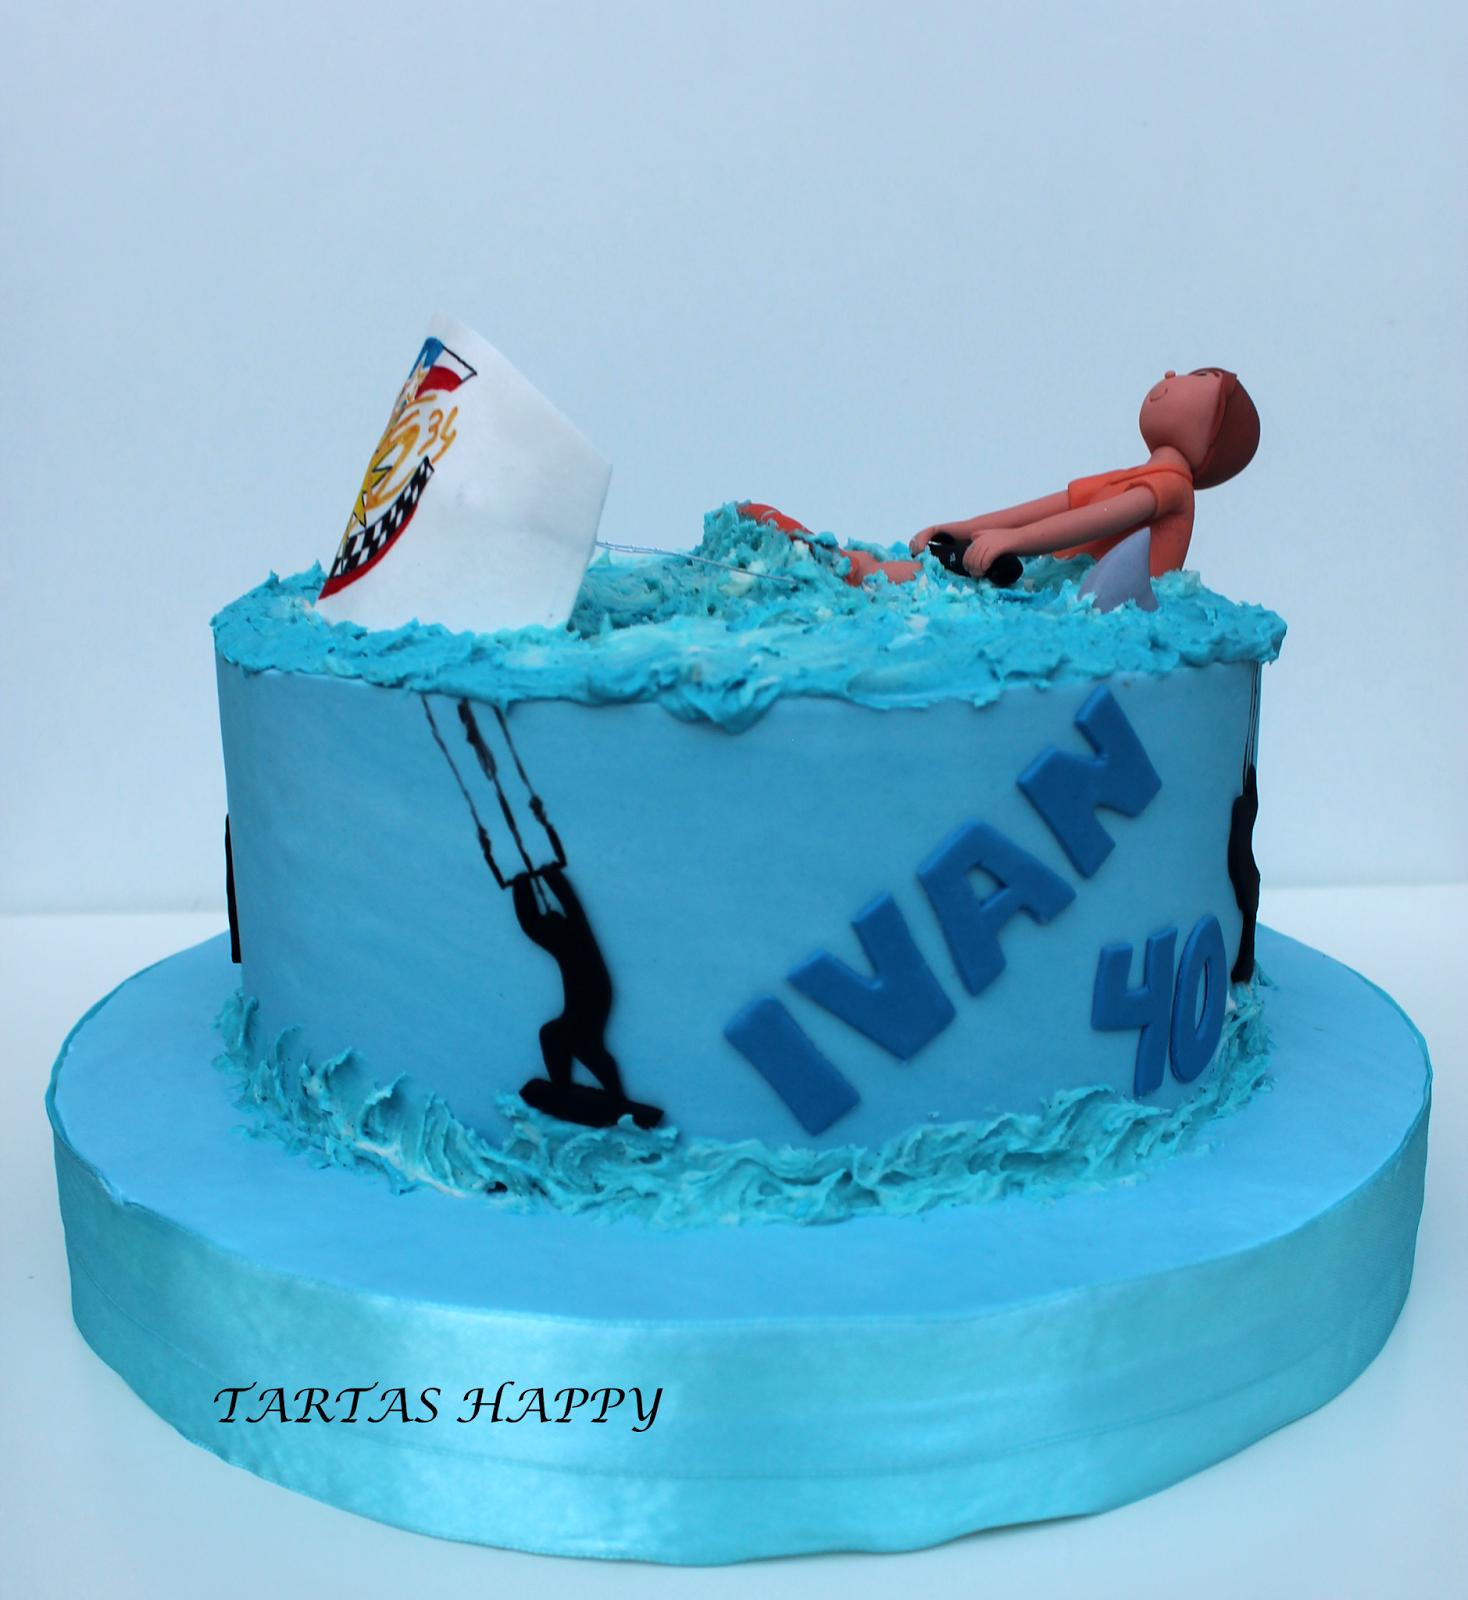 cake design kite kiteboarders birthday cake ideas for men - Google Search  Toy